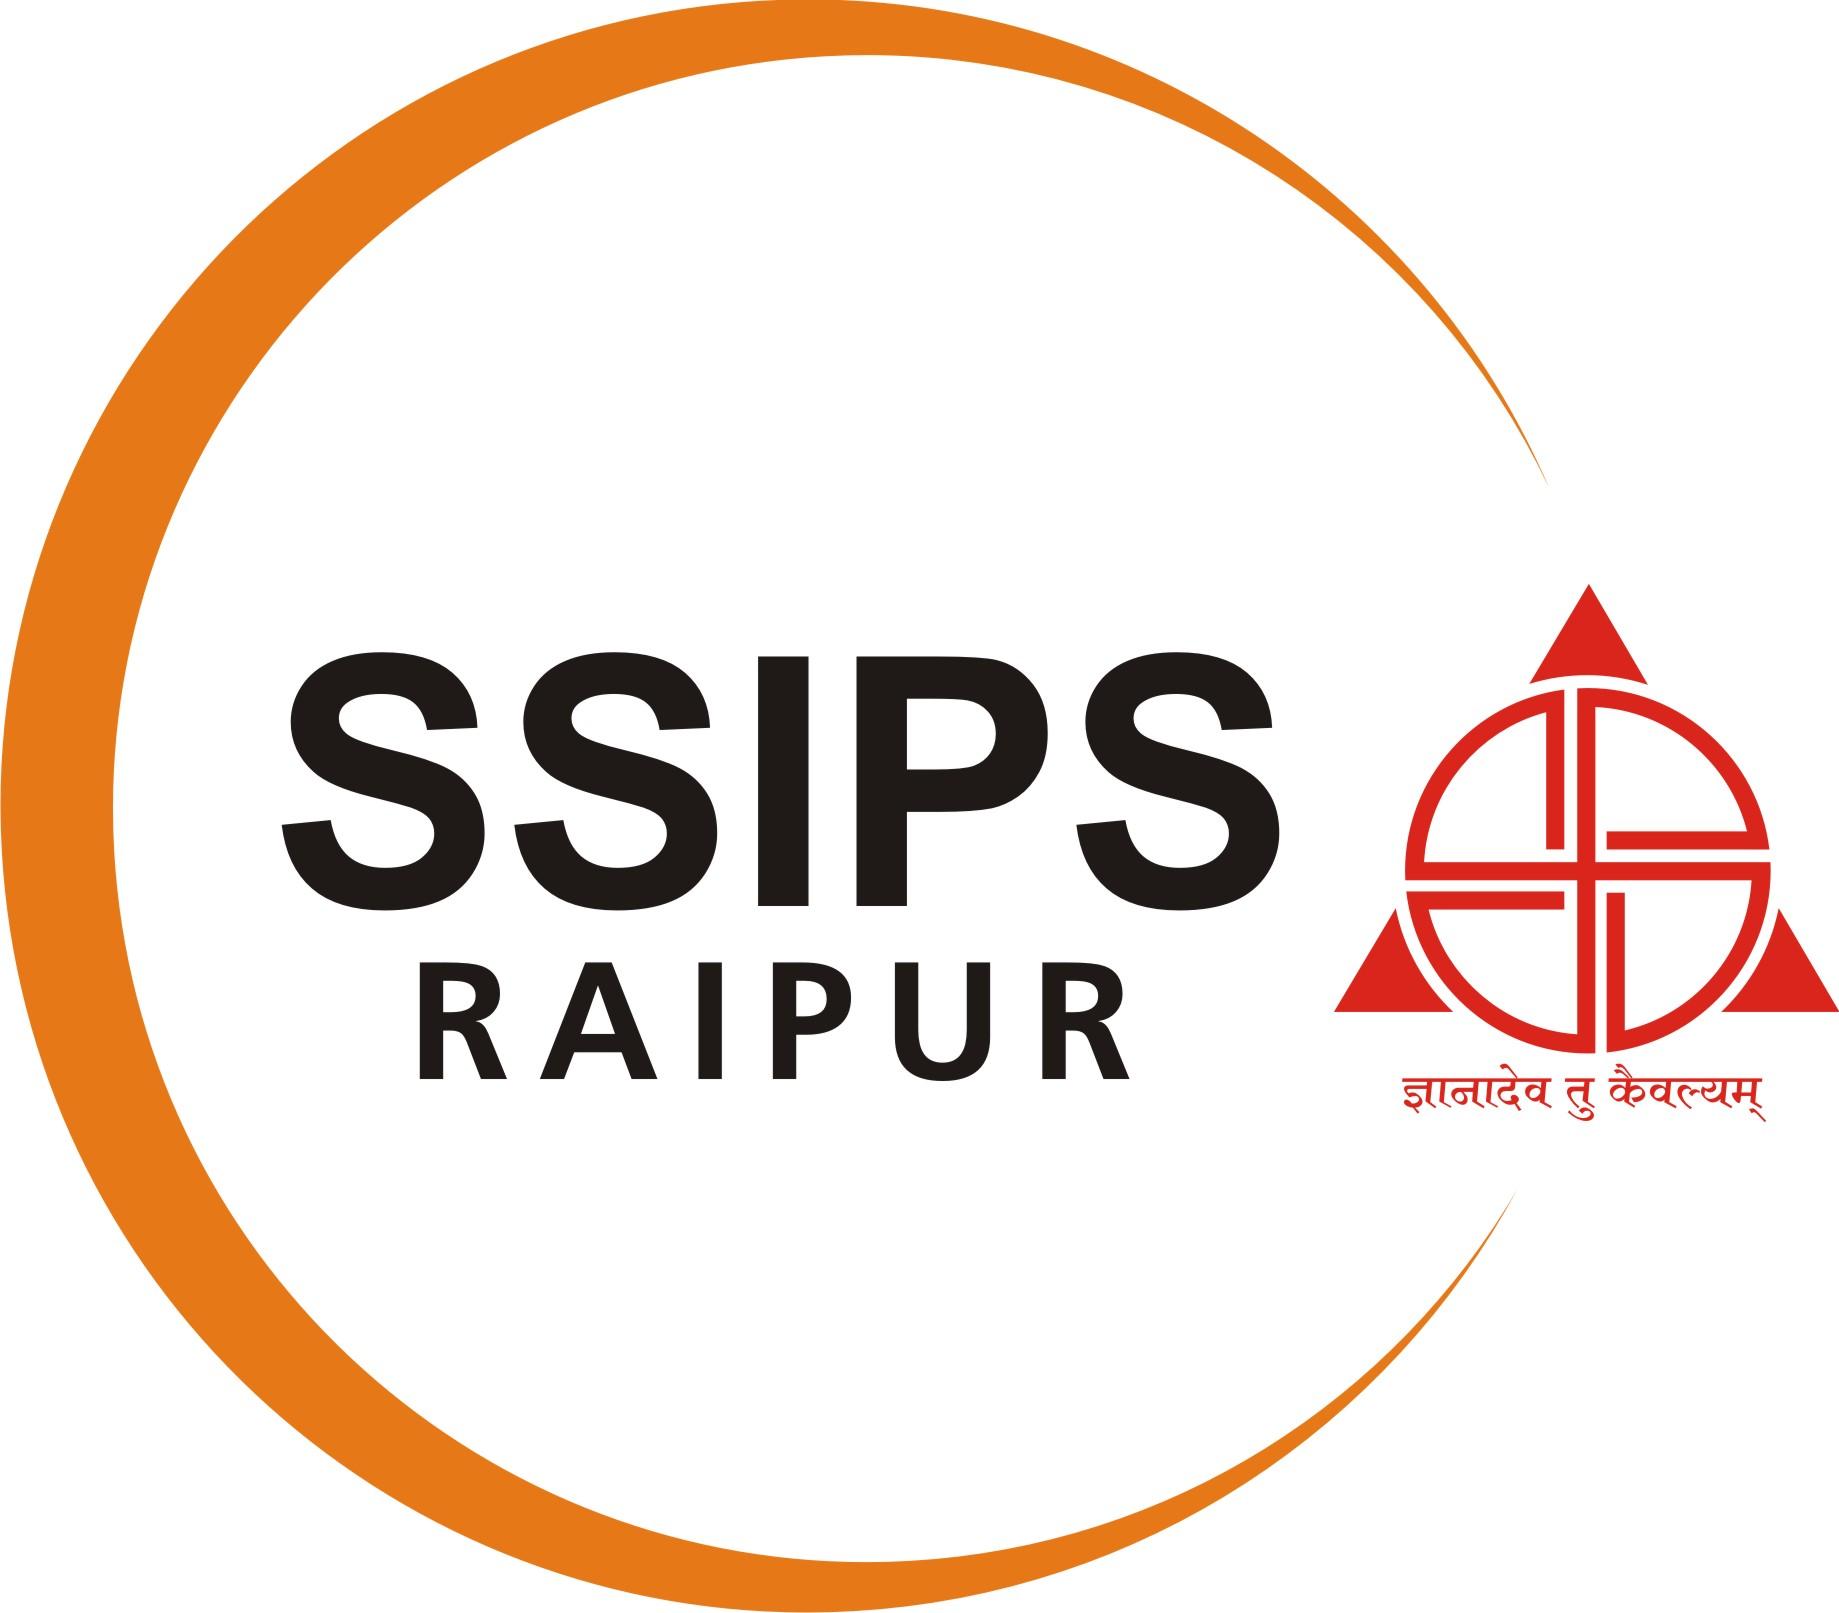 SSIPS-Raipur